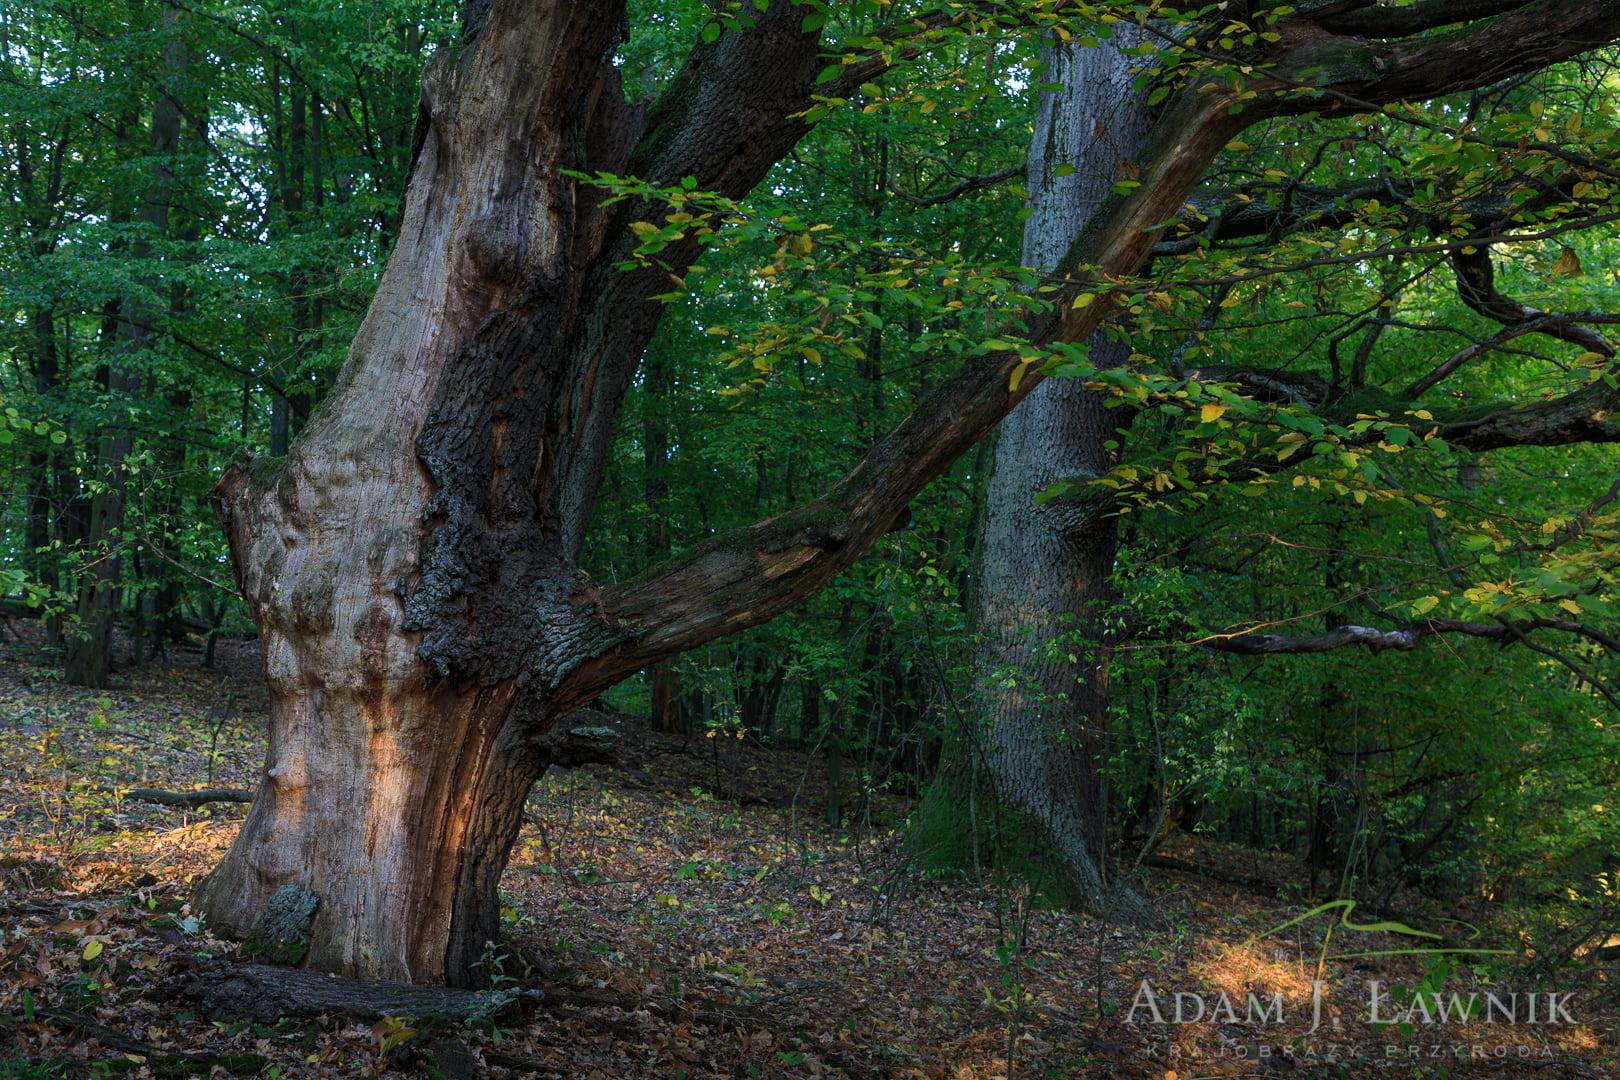 Kampinos National Park, Poland 1810-00463C